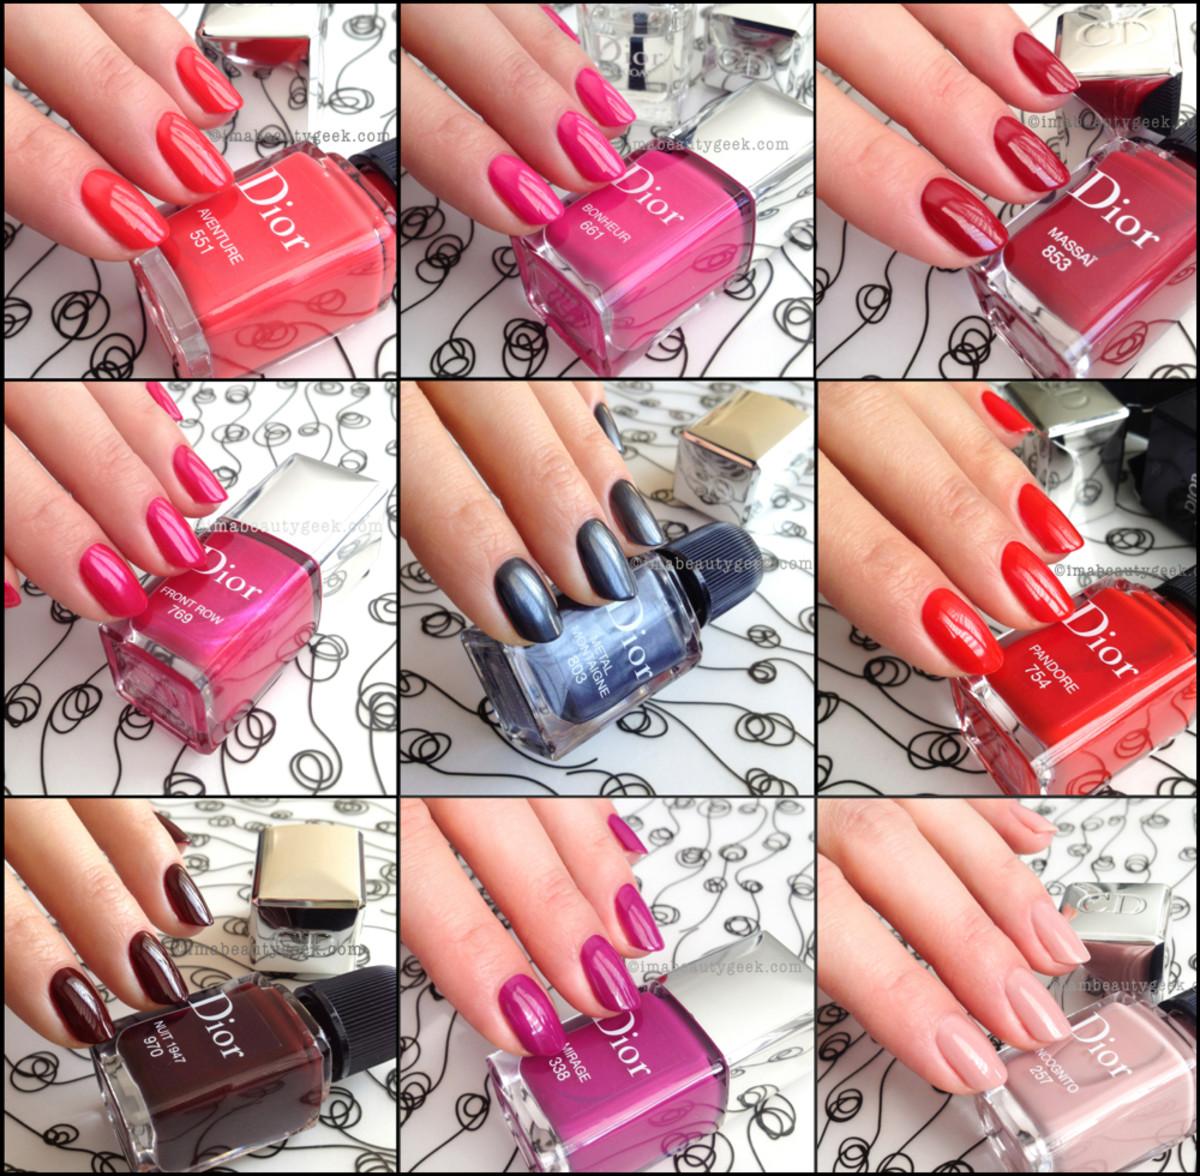 Dior Polish: New Vernis Gel Shine Color, i love u a whole lot ...